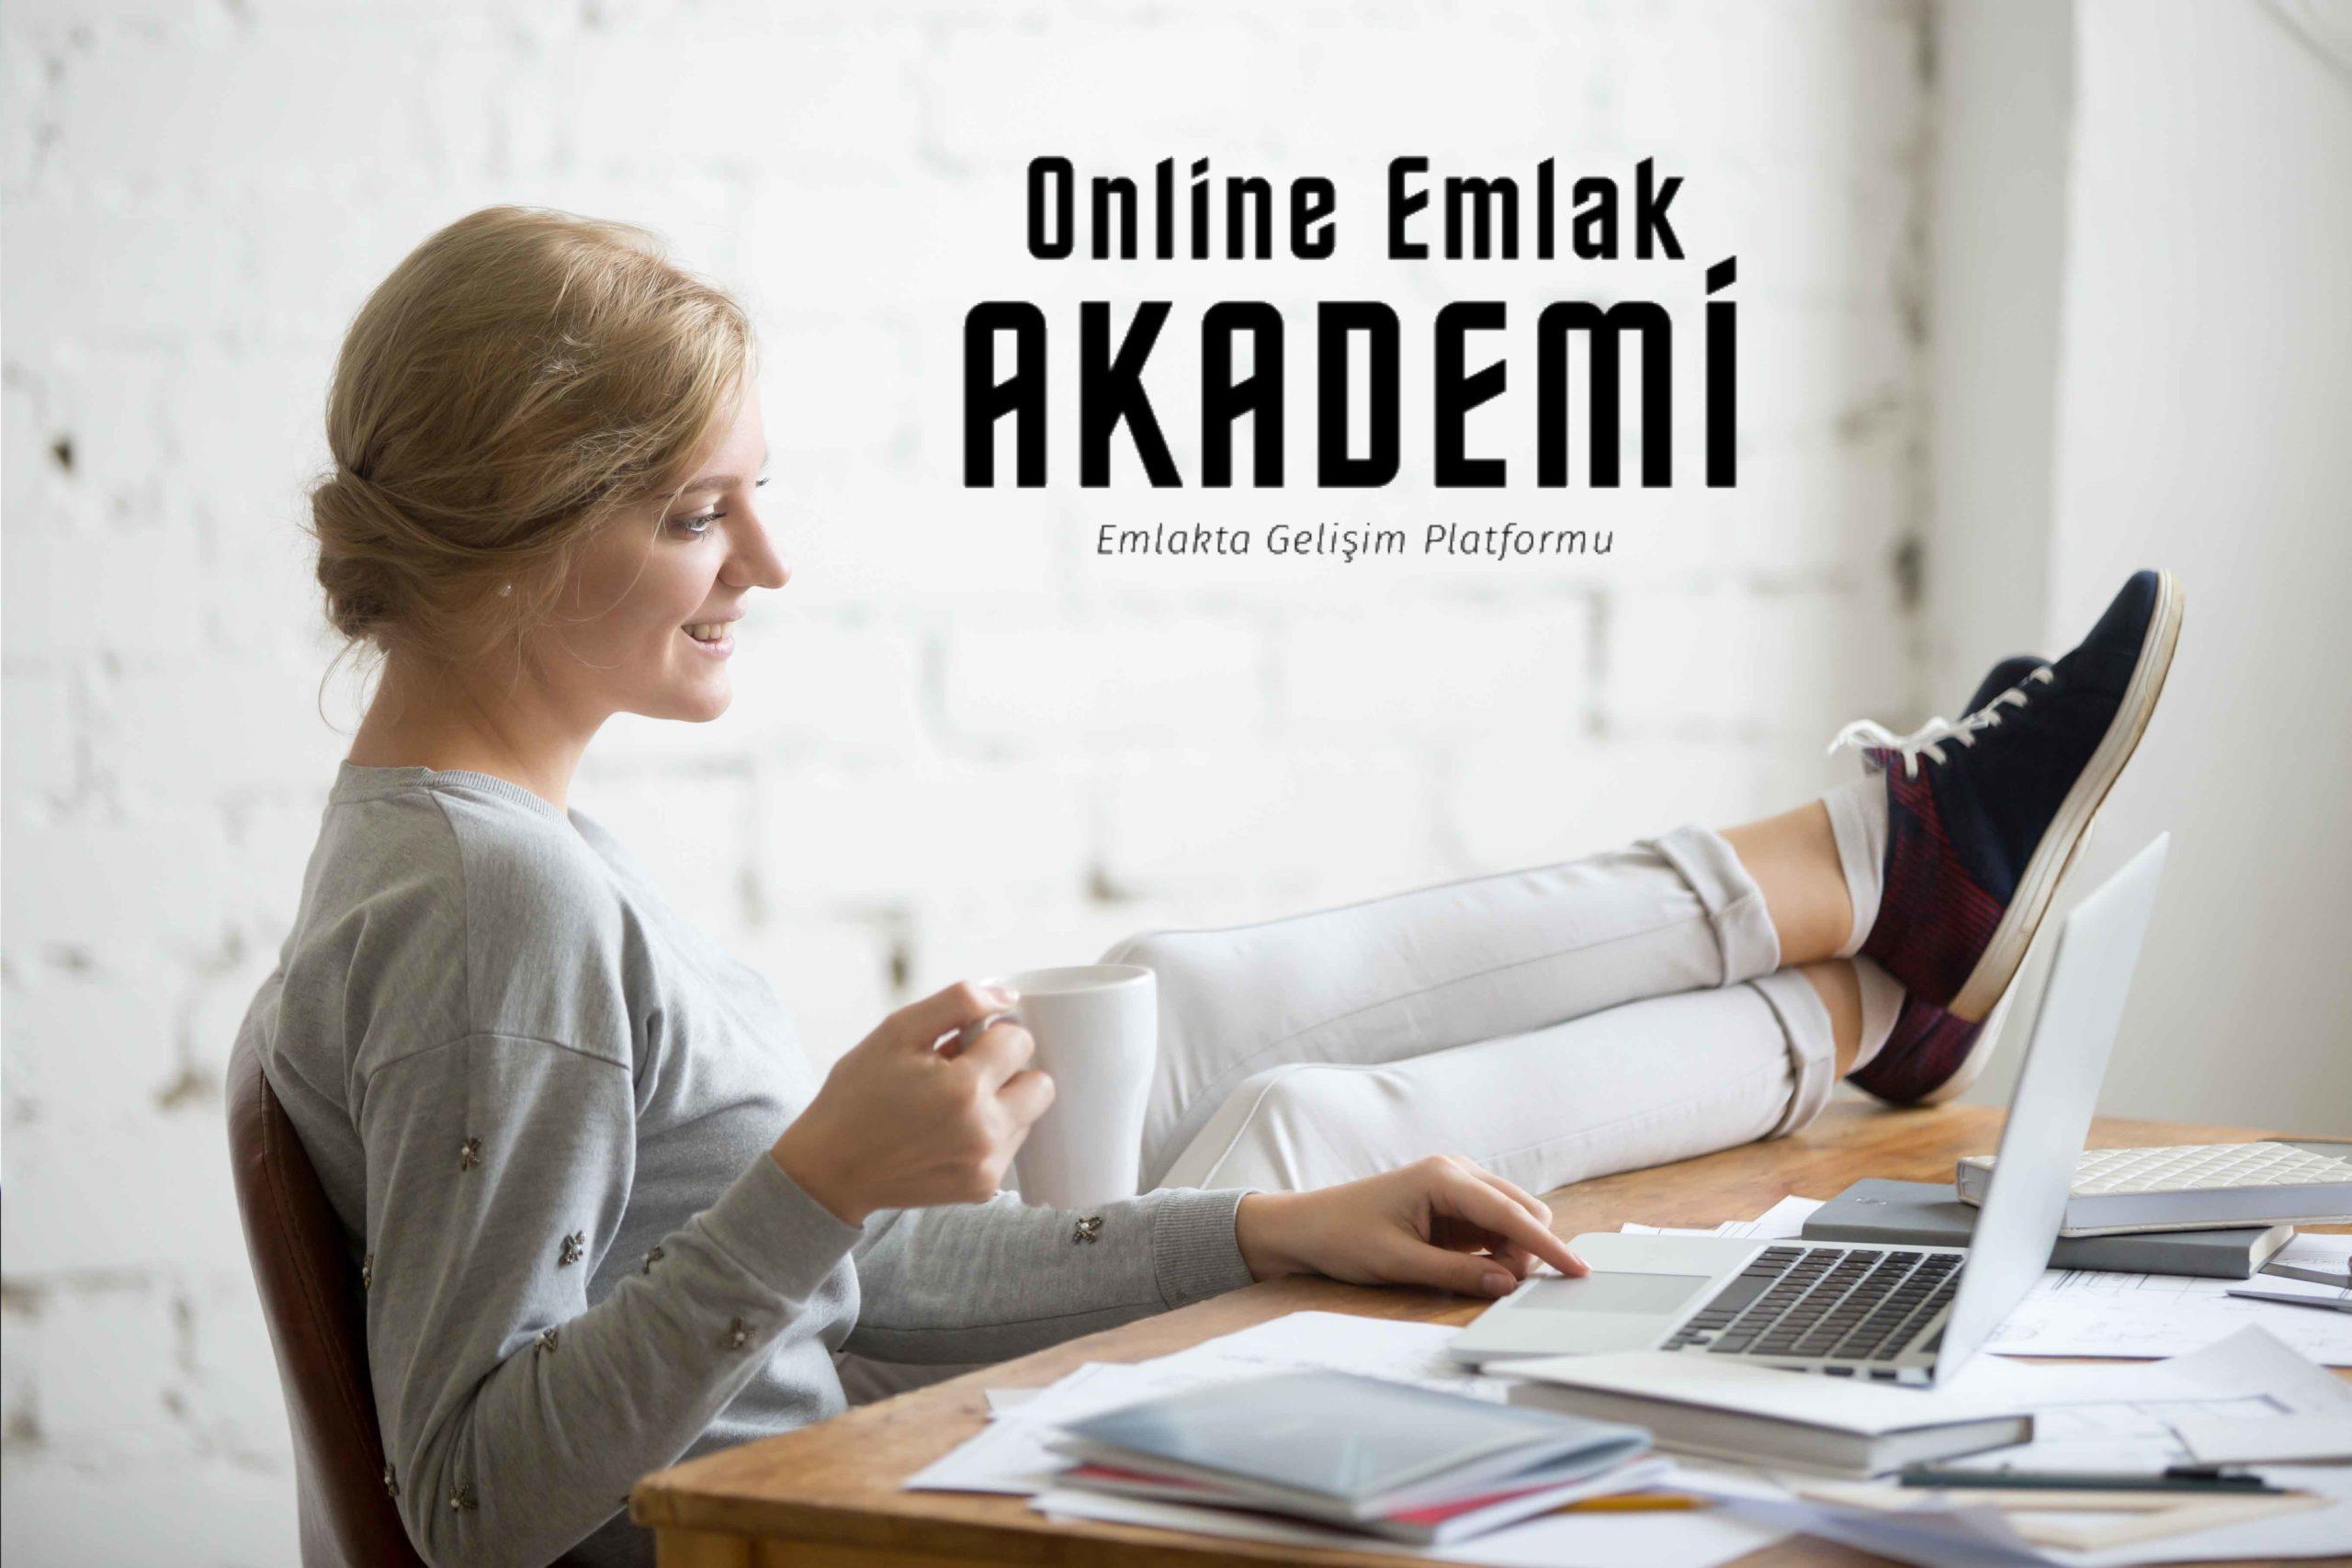 online emlak akademi